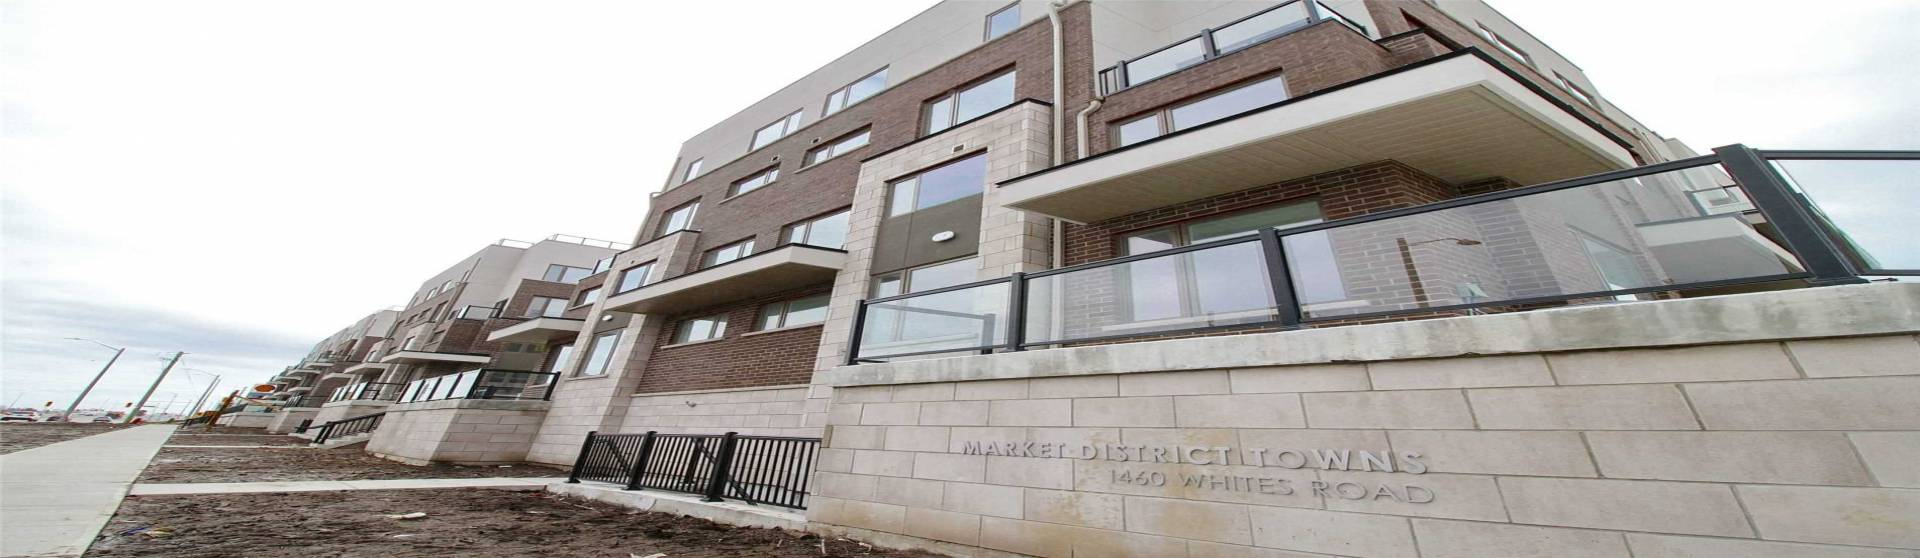 1460 Whites Rd, Pickering, Ontario L1V0E8, 2 Bedrooms Bedrooms, 6 Rooms Rooms,3 BathroomsBathrooms,Condo Townhouse,Sale,Whites,E4813021